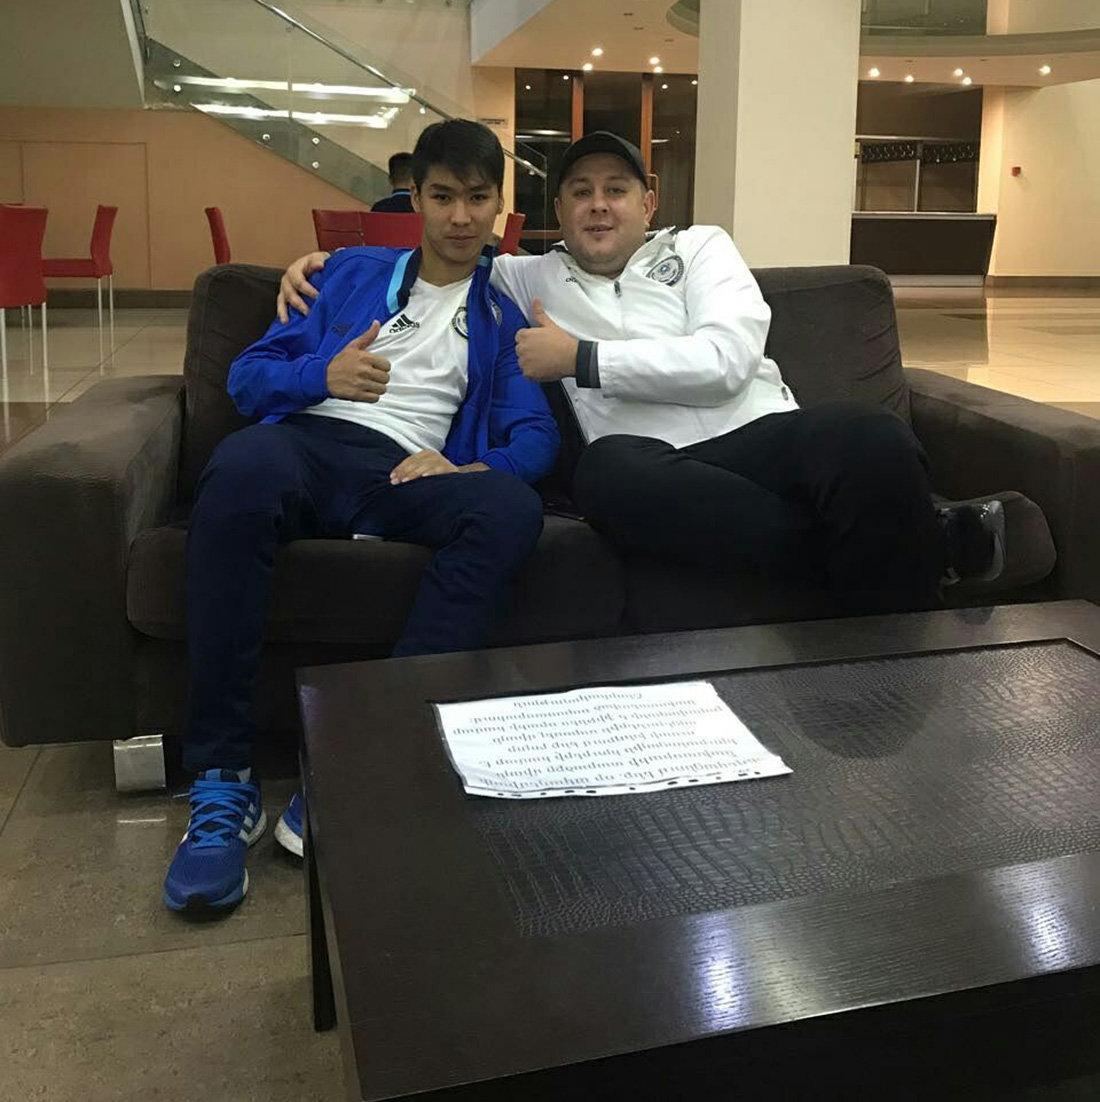 Старший тренер юношеской сборной Казахстана Александр Кузнецов (слева)  и казахстанский футболист Еркебулан Сейдахмет